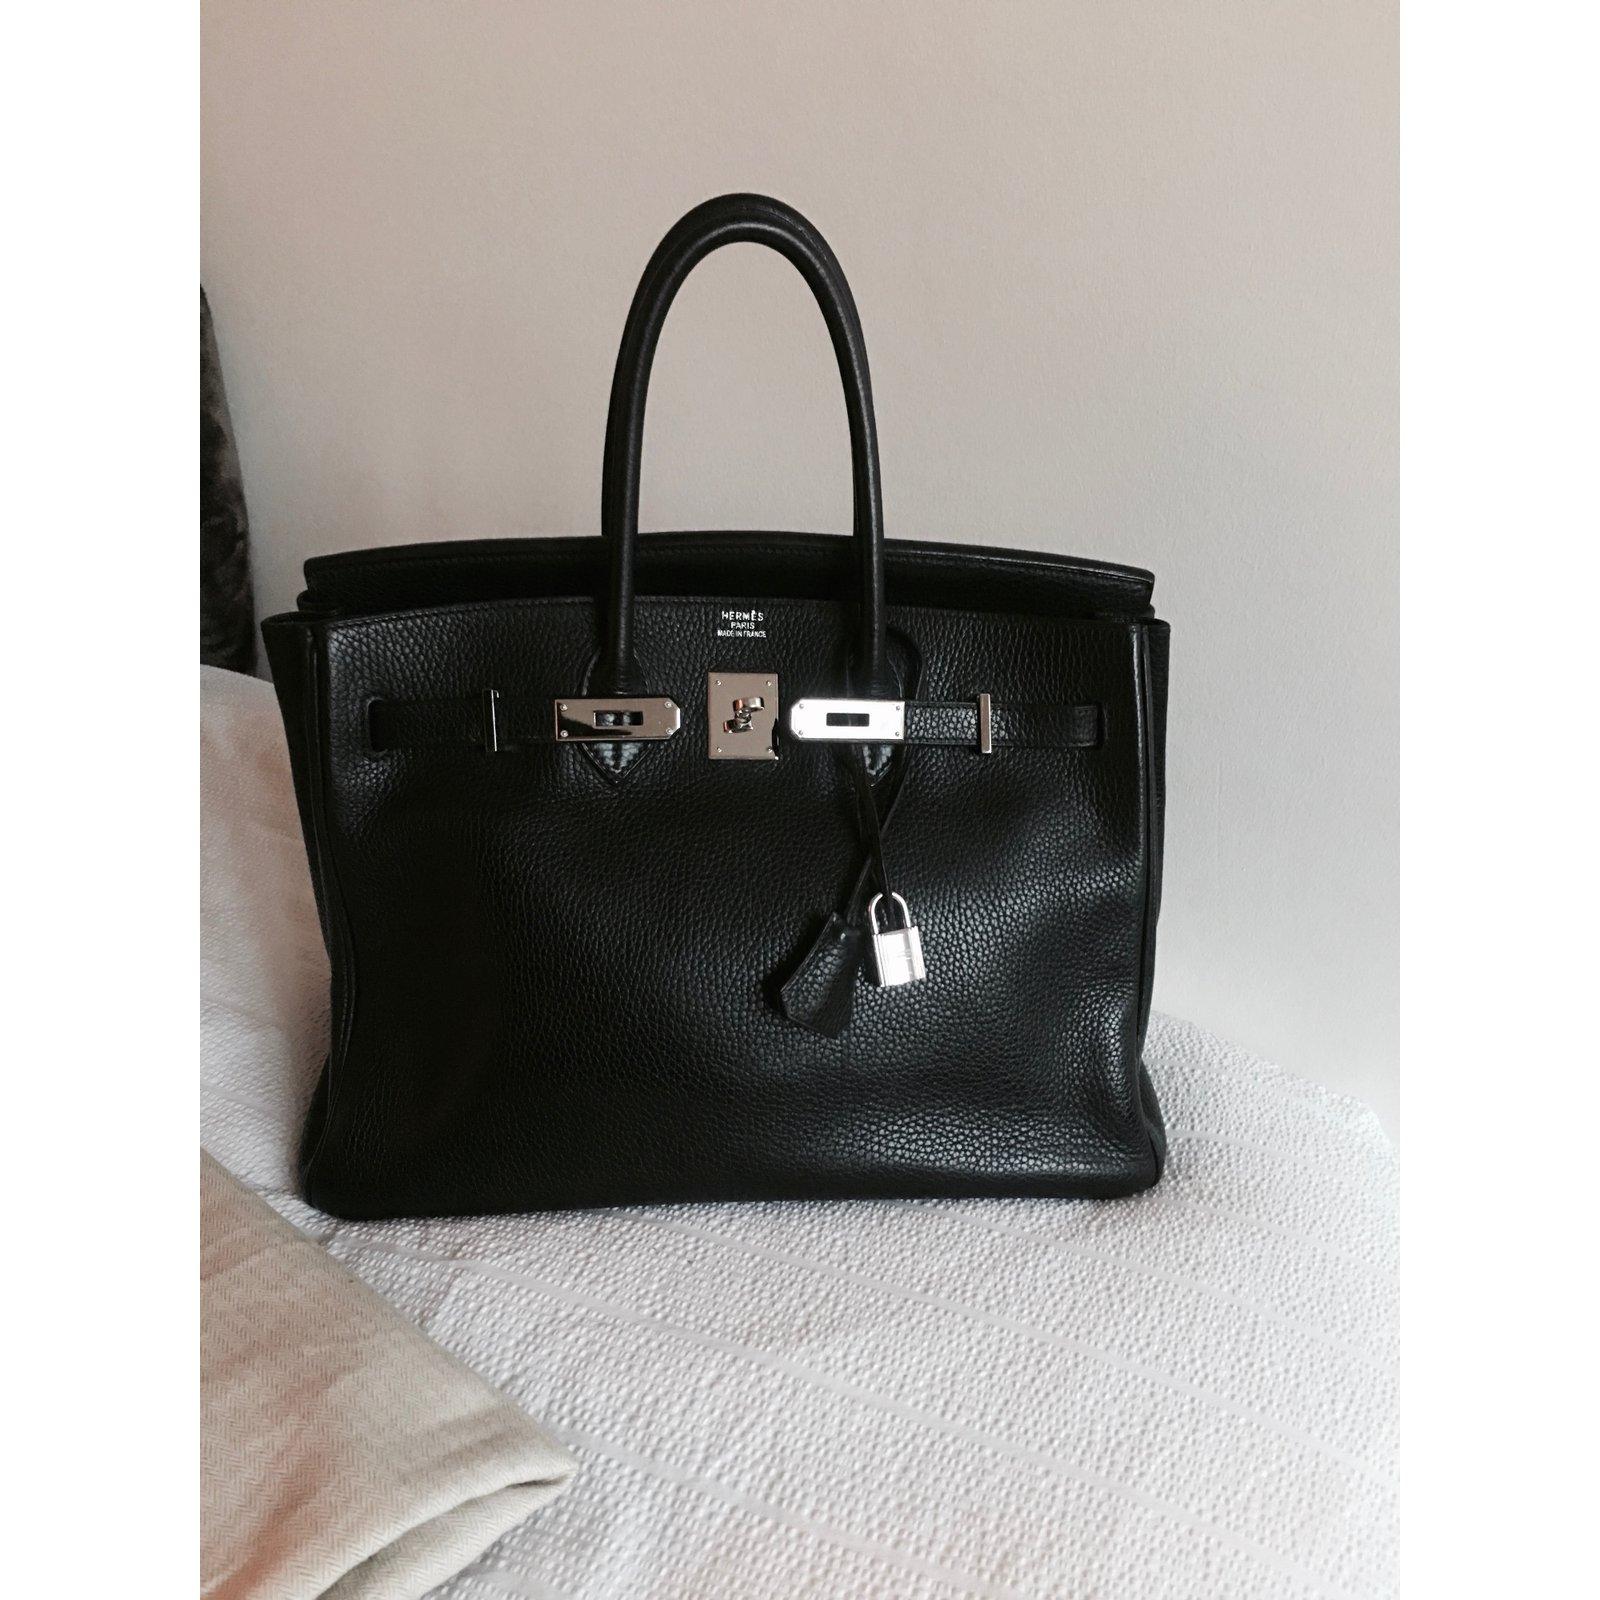 Sac HERMES Birkin cuir Togo noir 35 cm